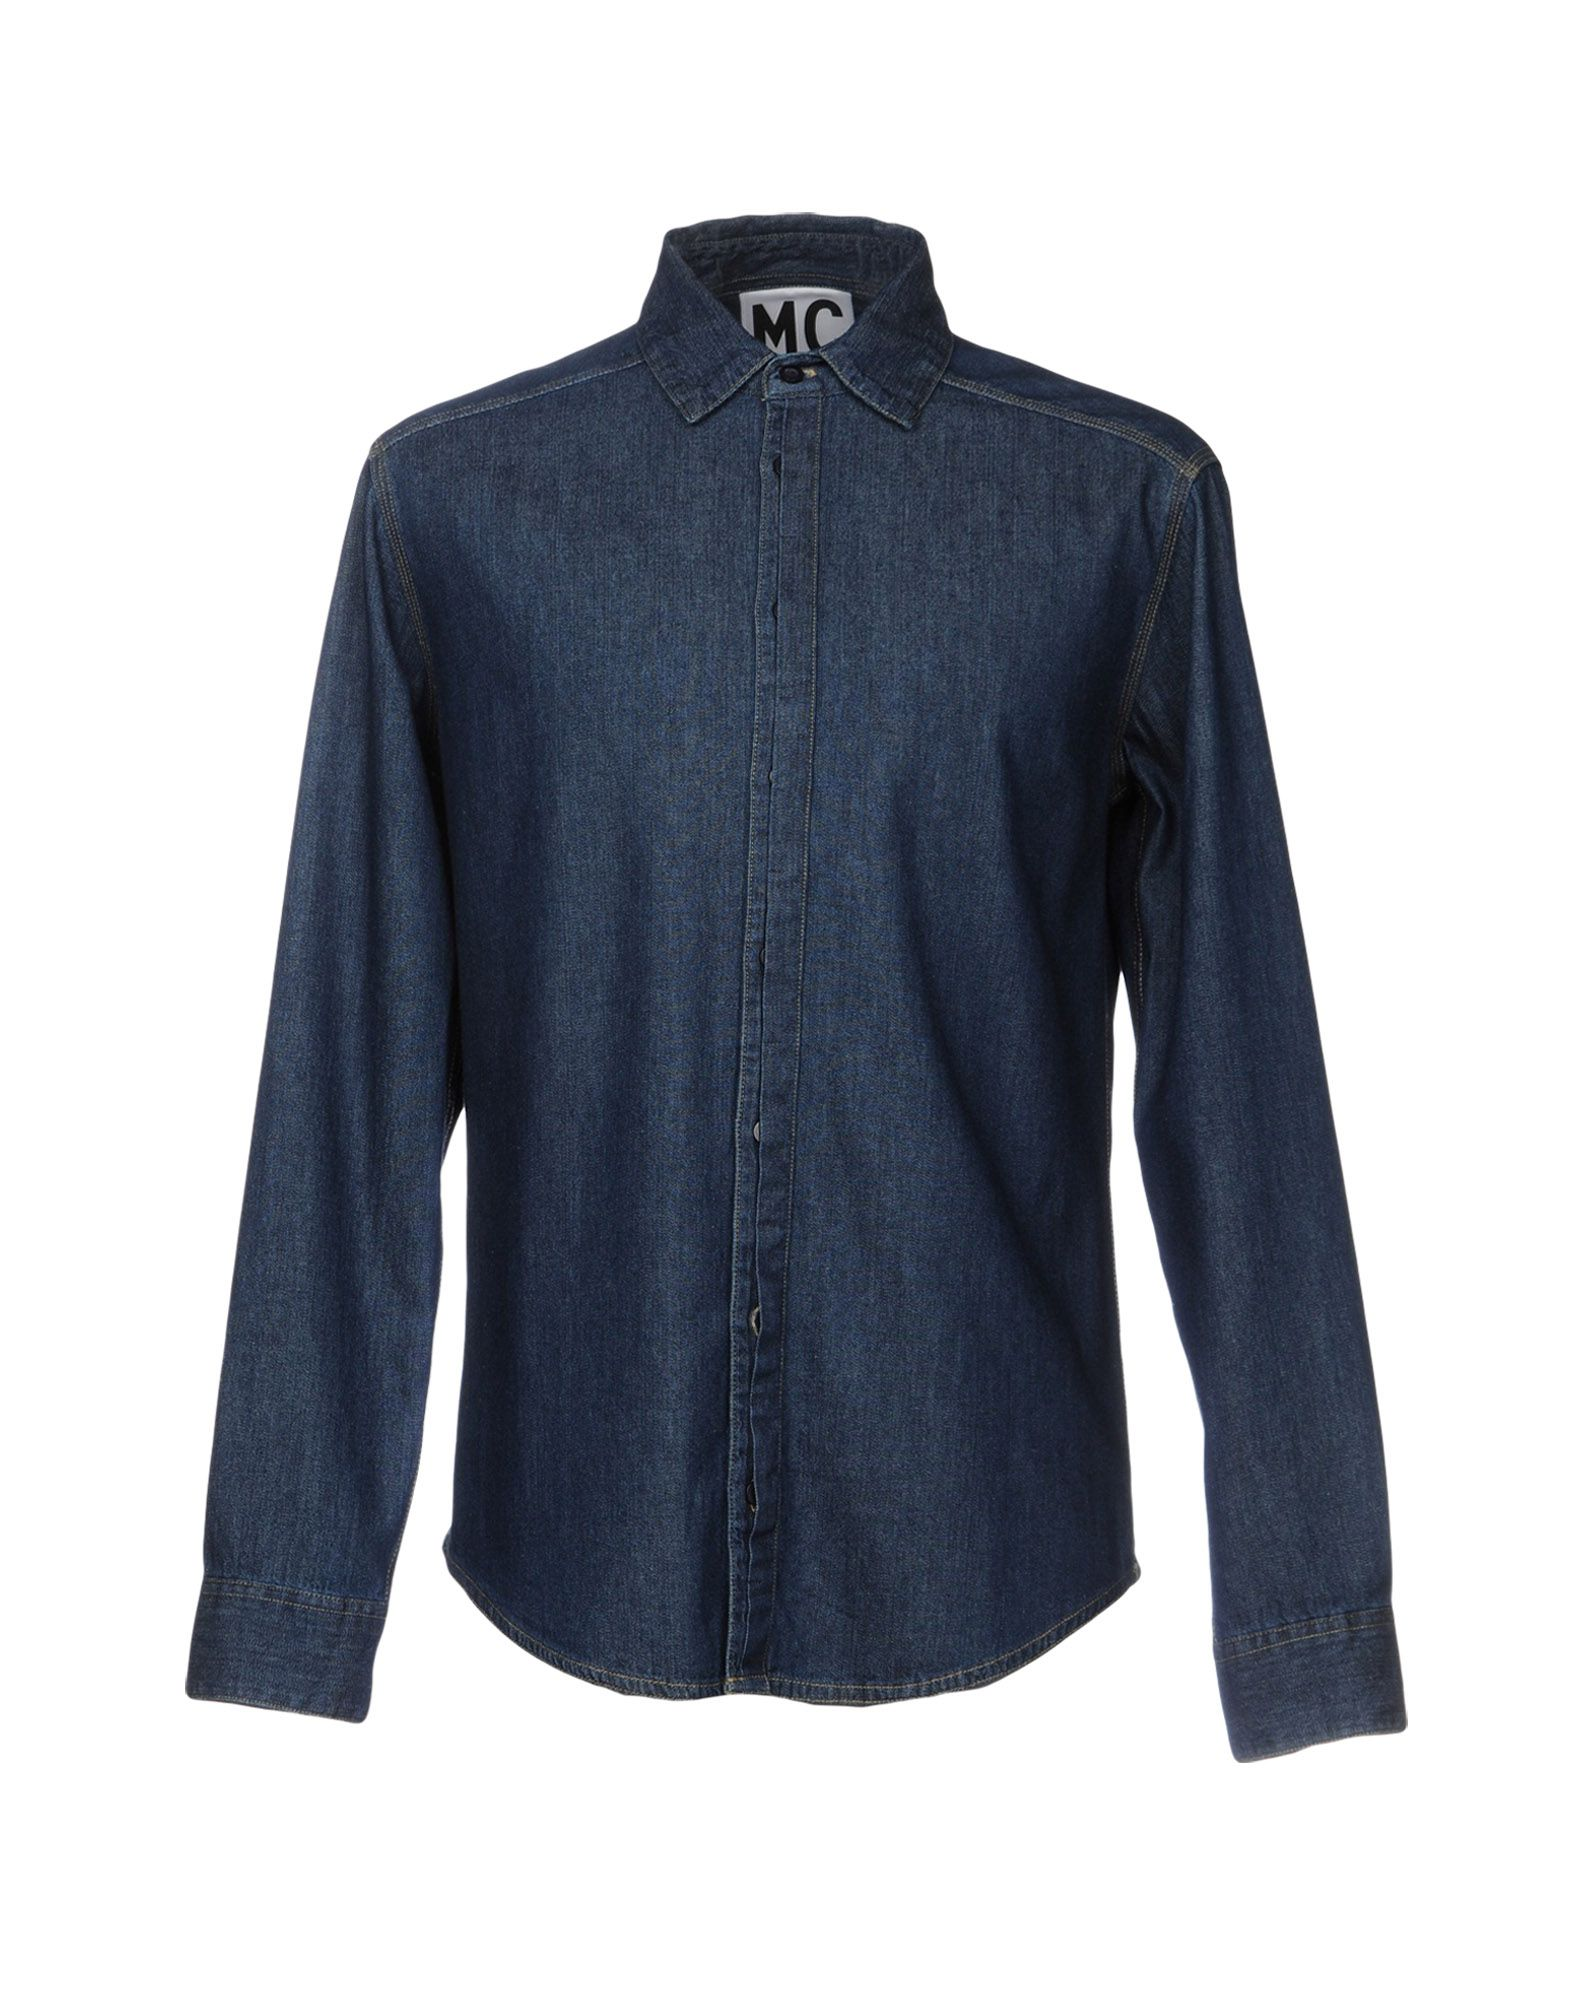 Camicia Jeans Mc Master Of Ceremonies Donna - Acquista online su